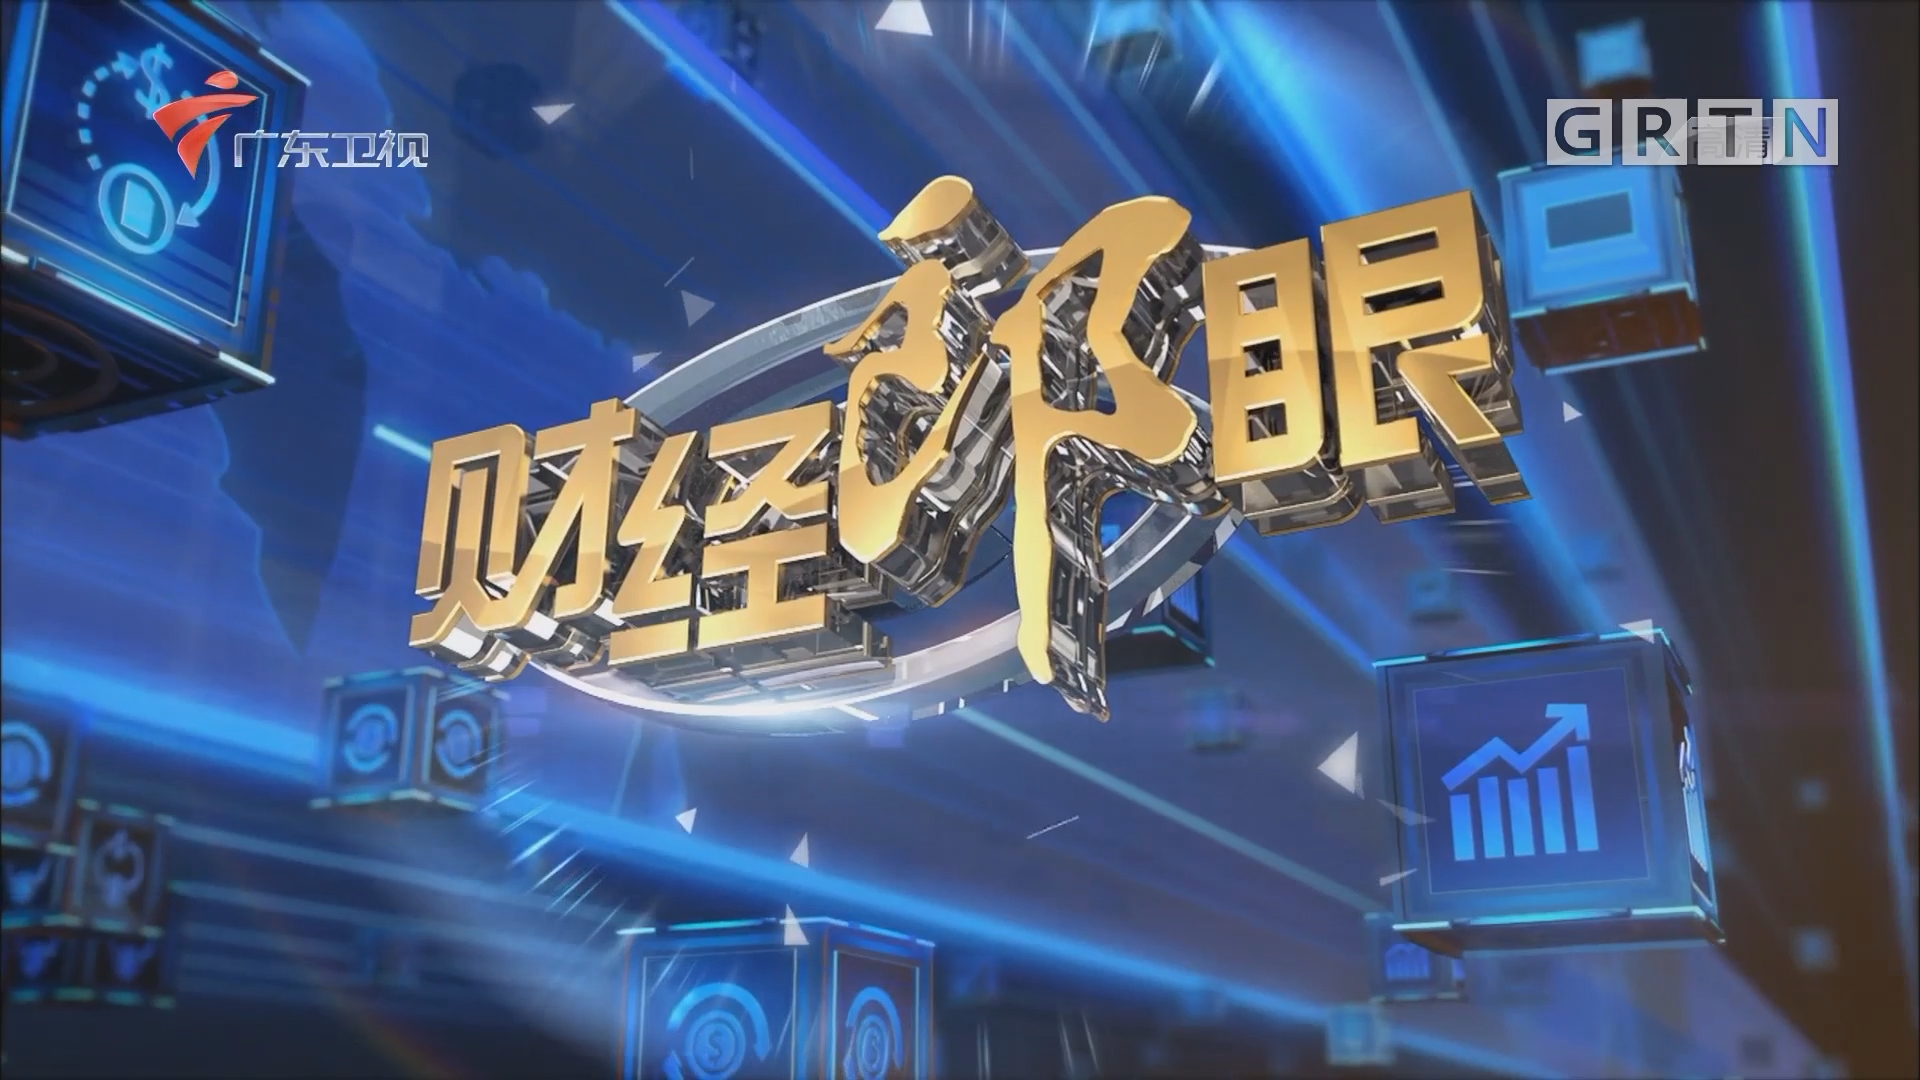 [HD][2018-08-13]财经郎眼:新能源车再起变局